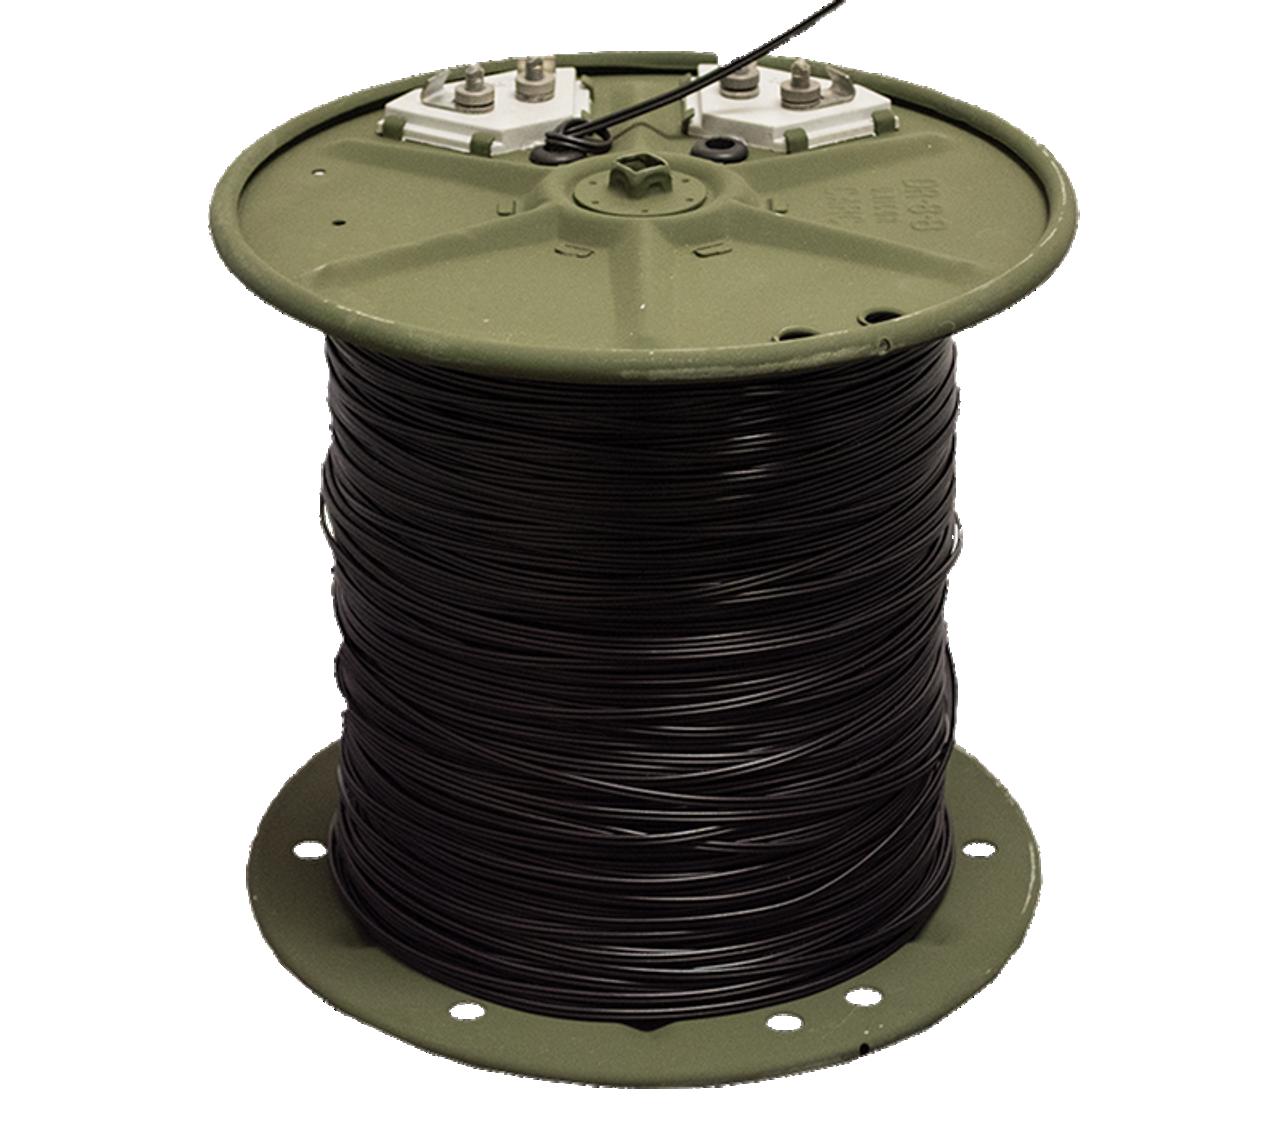 CMS U.S. G.I. Telephone Cable